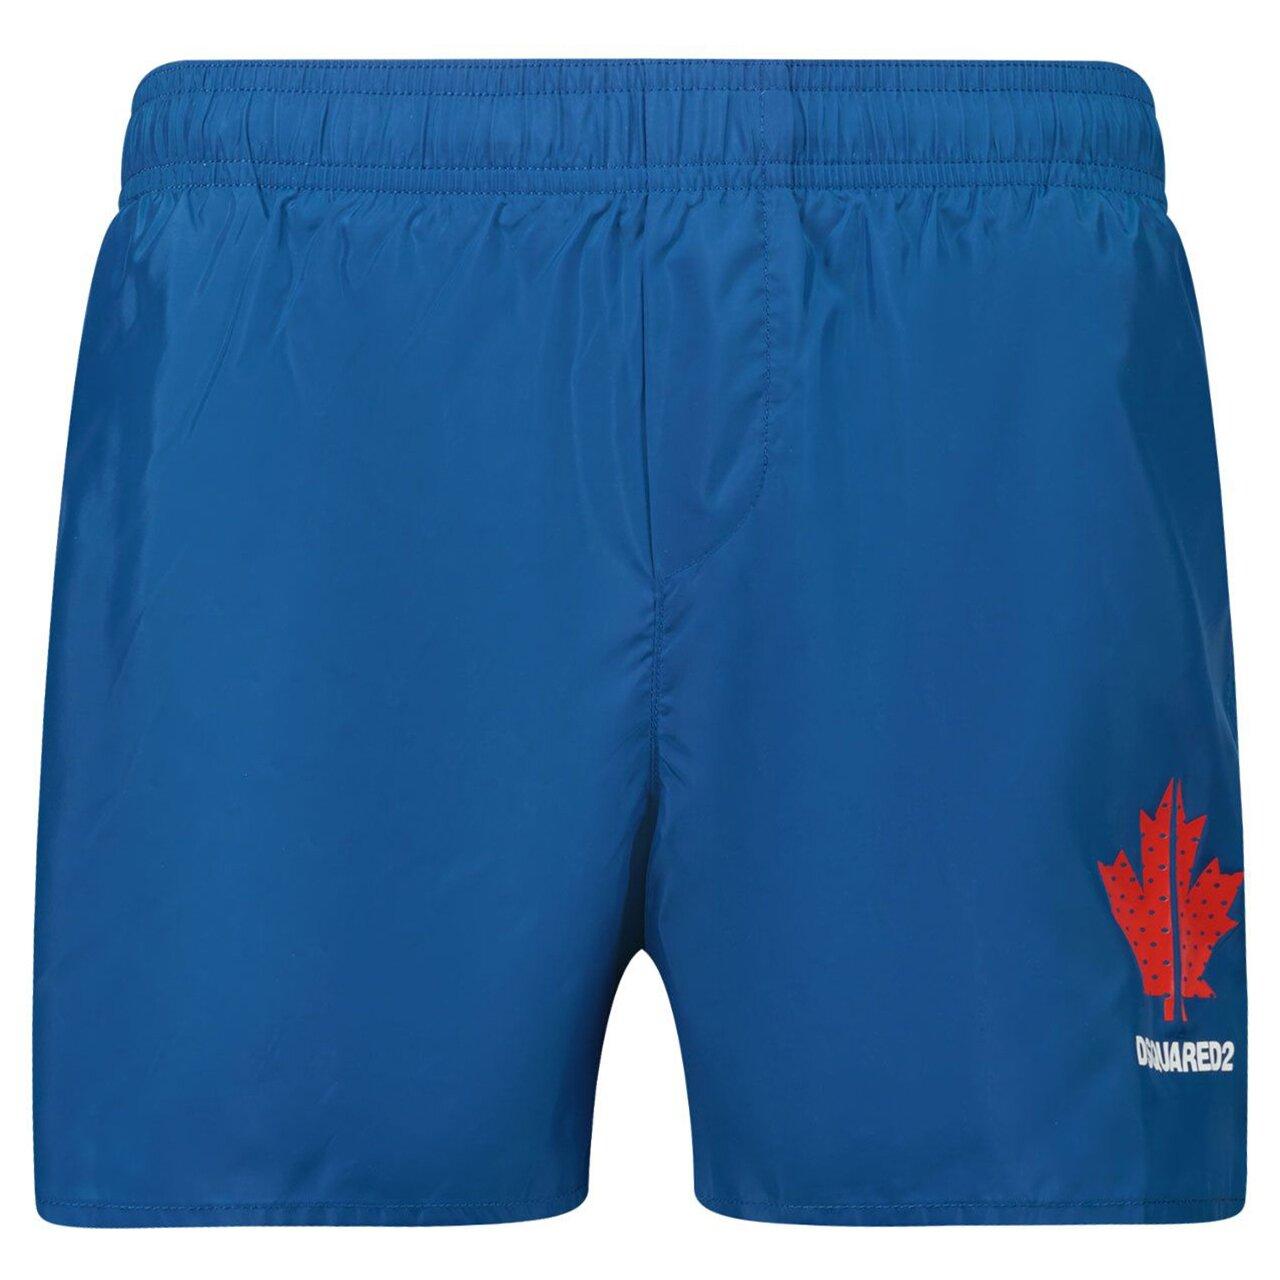 Dsquared2 Swim shorts Blauw DQ0052